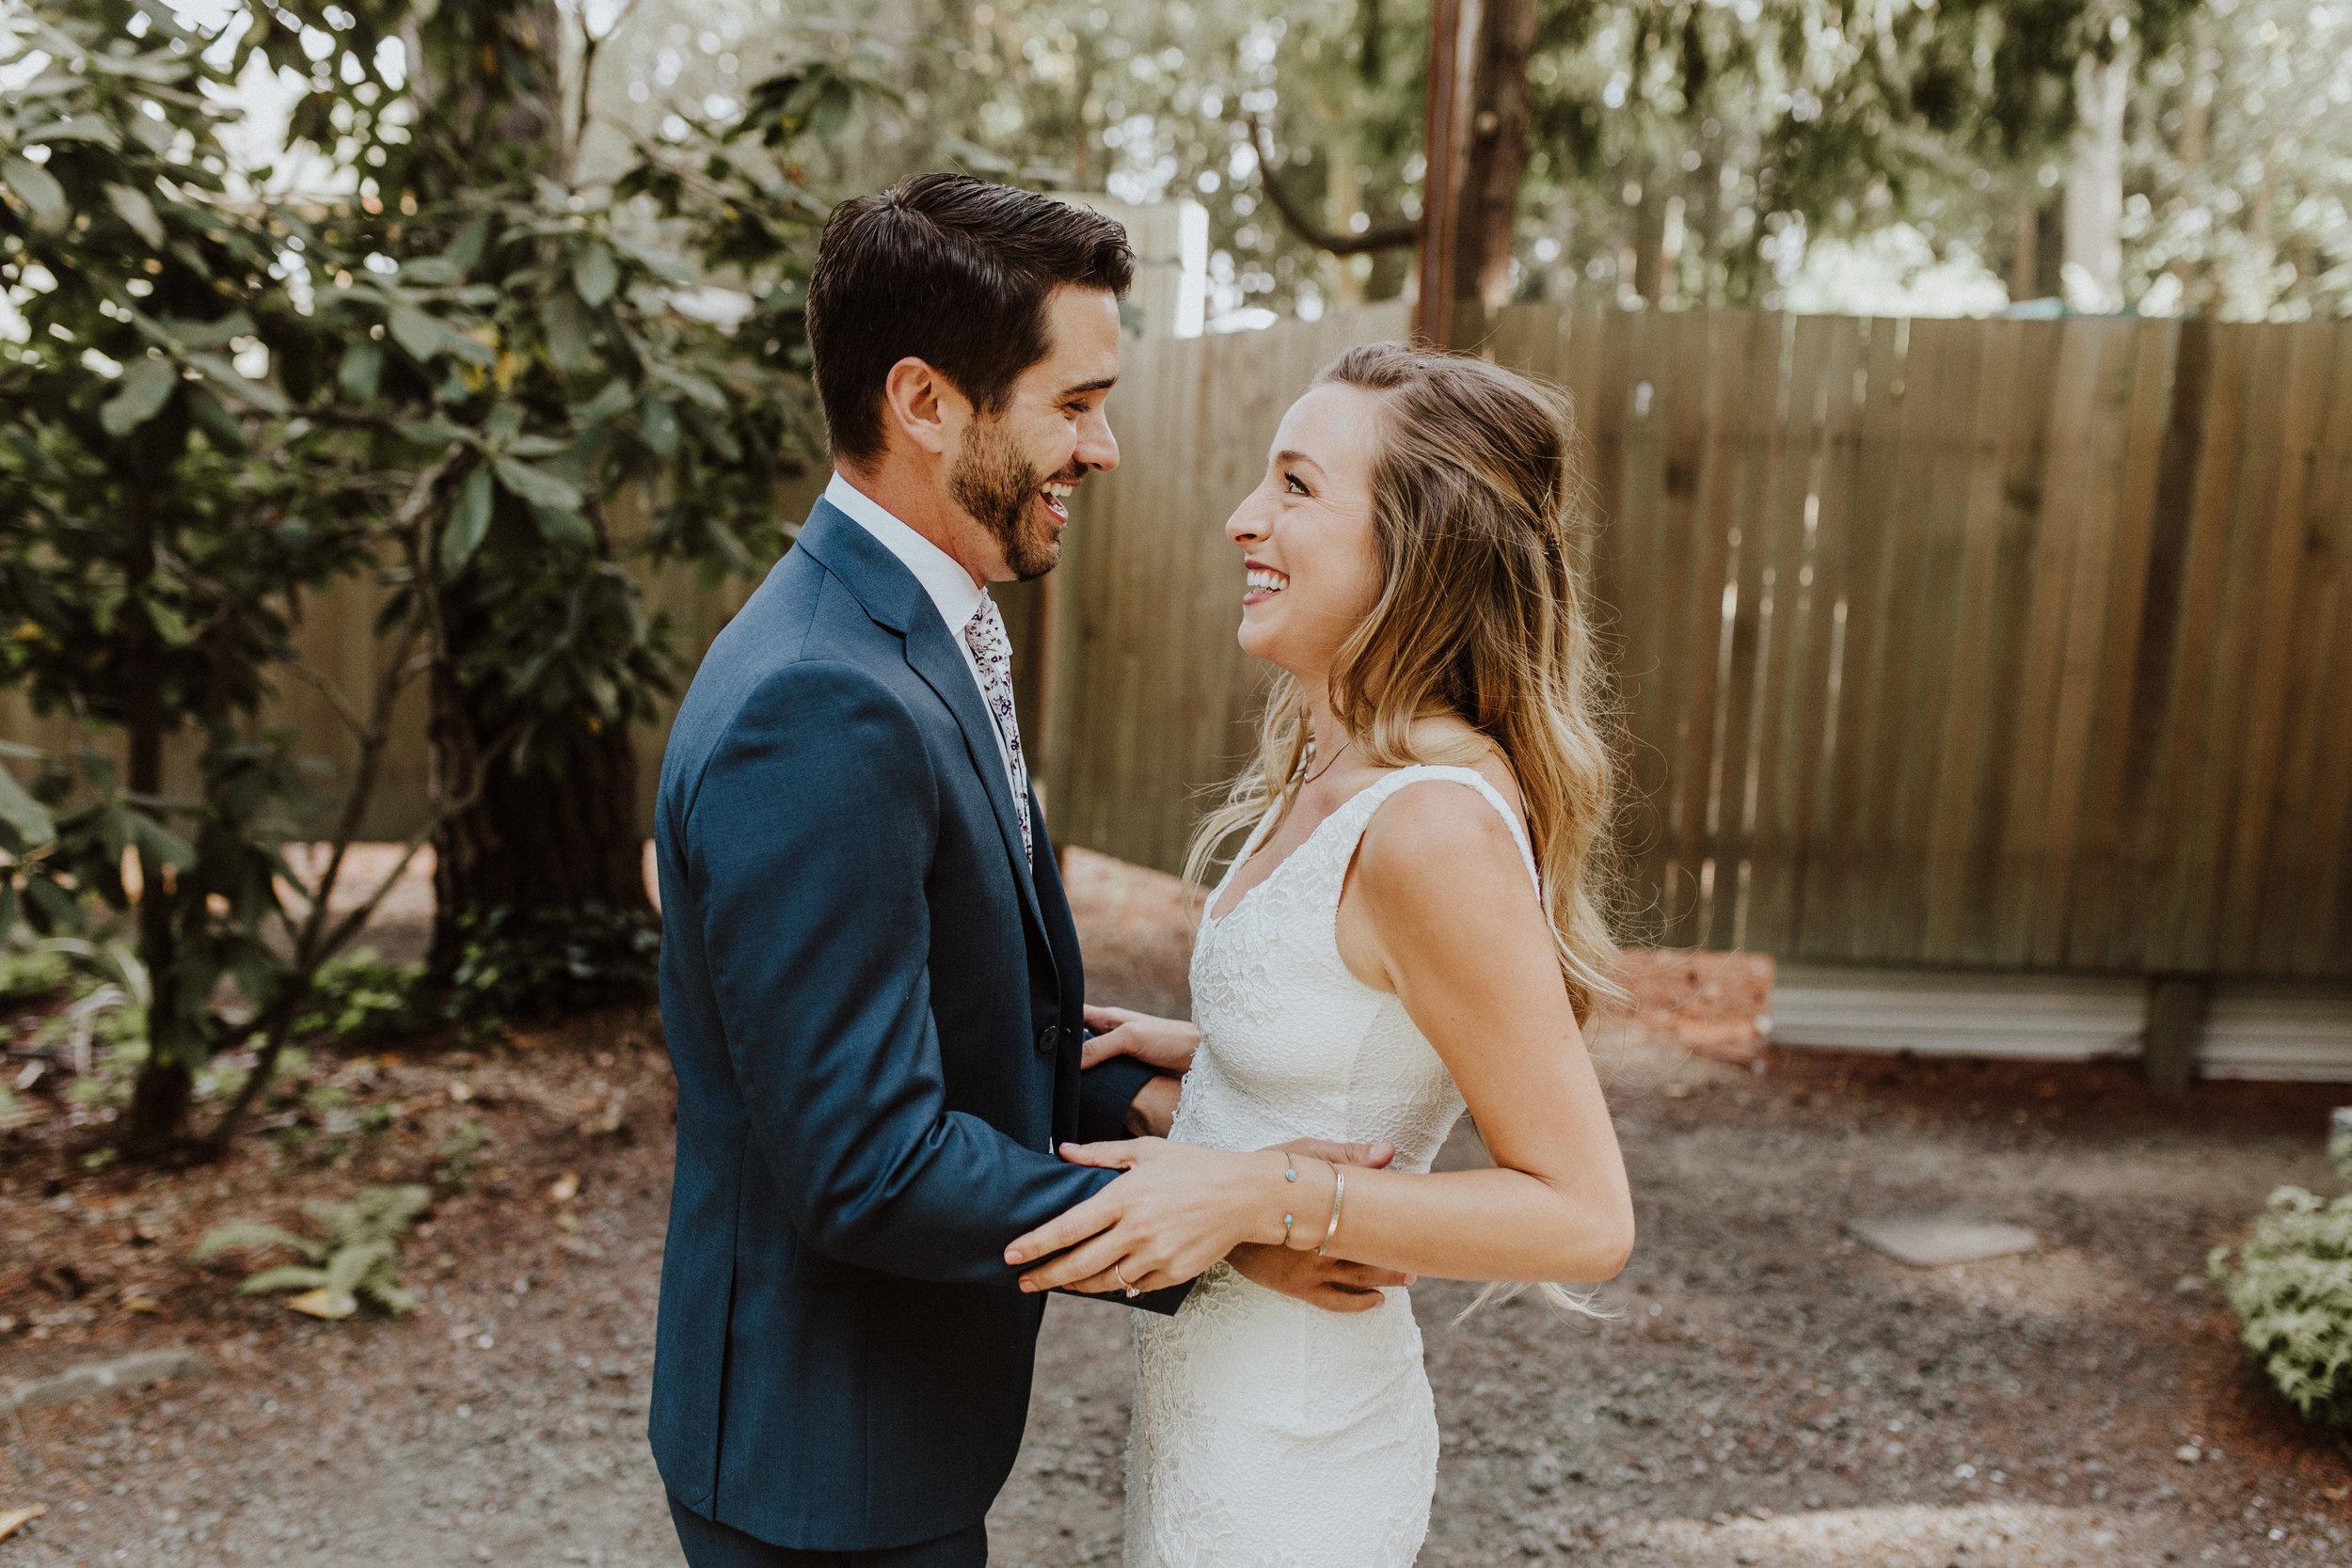 kiana lodge wedding photographer seattle washington